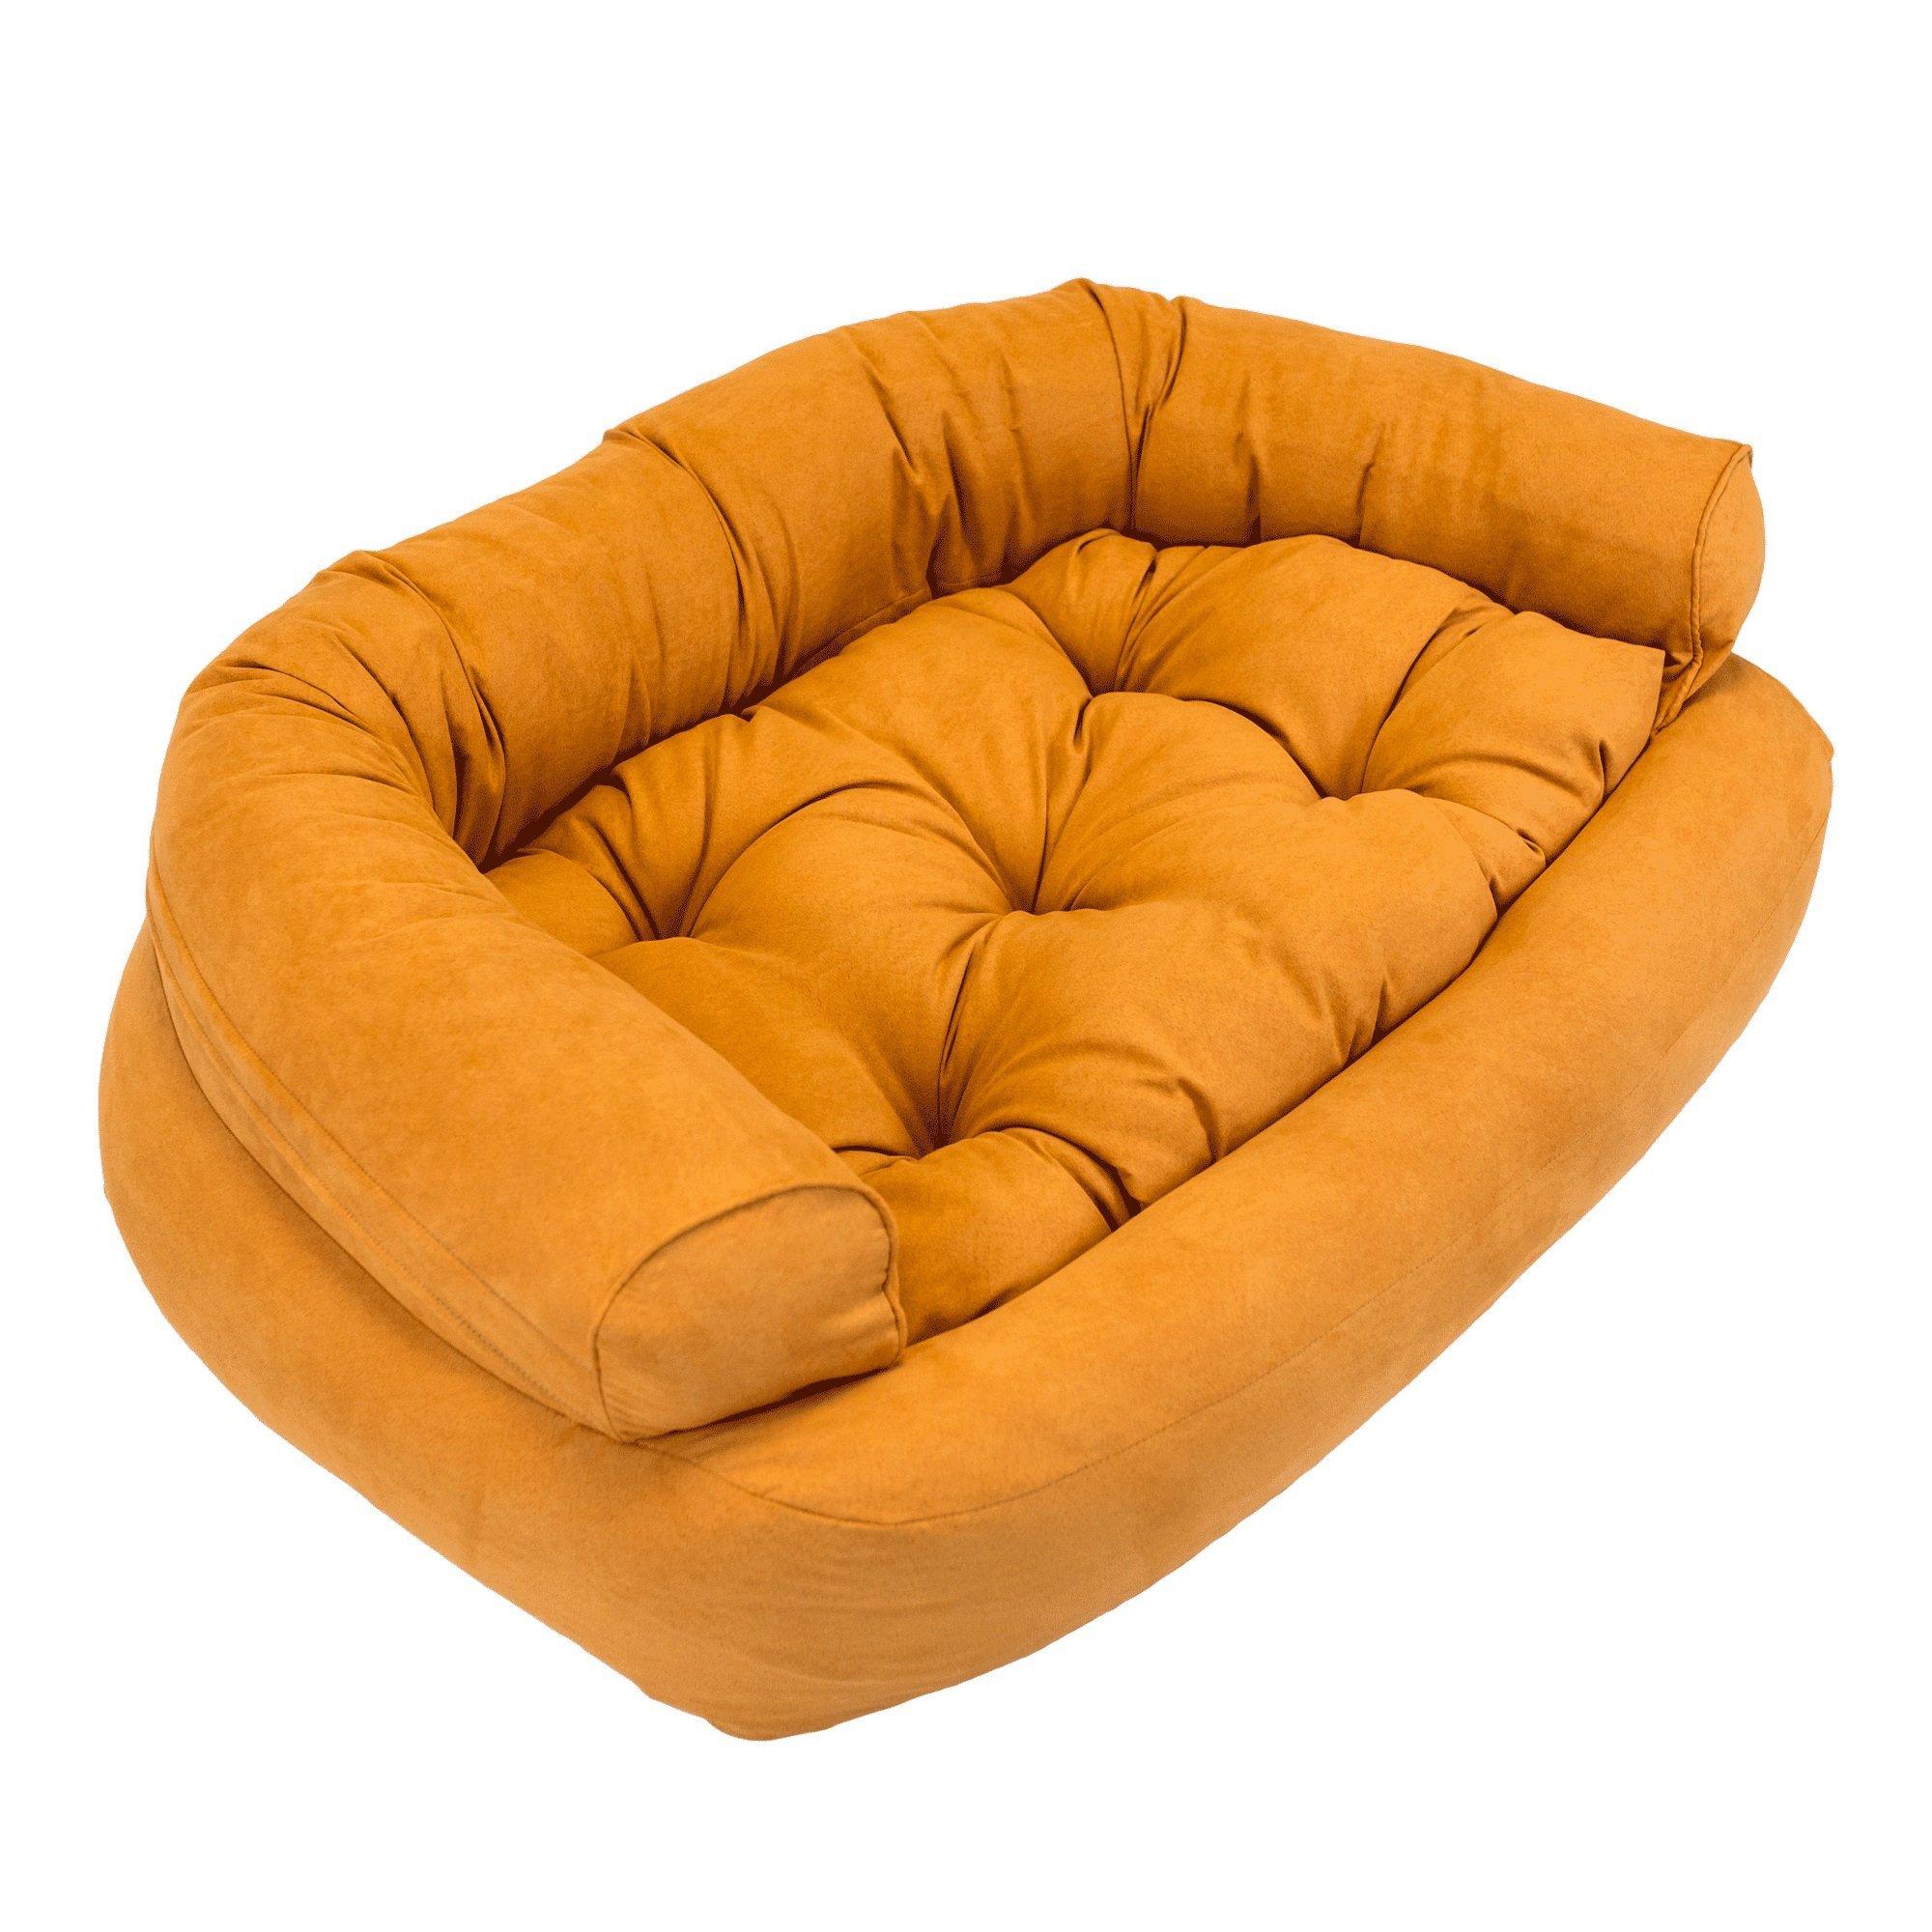 Snoozer Overstuffed Luxury Pet Sofa, X-Large, Shona Brown Sugar